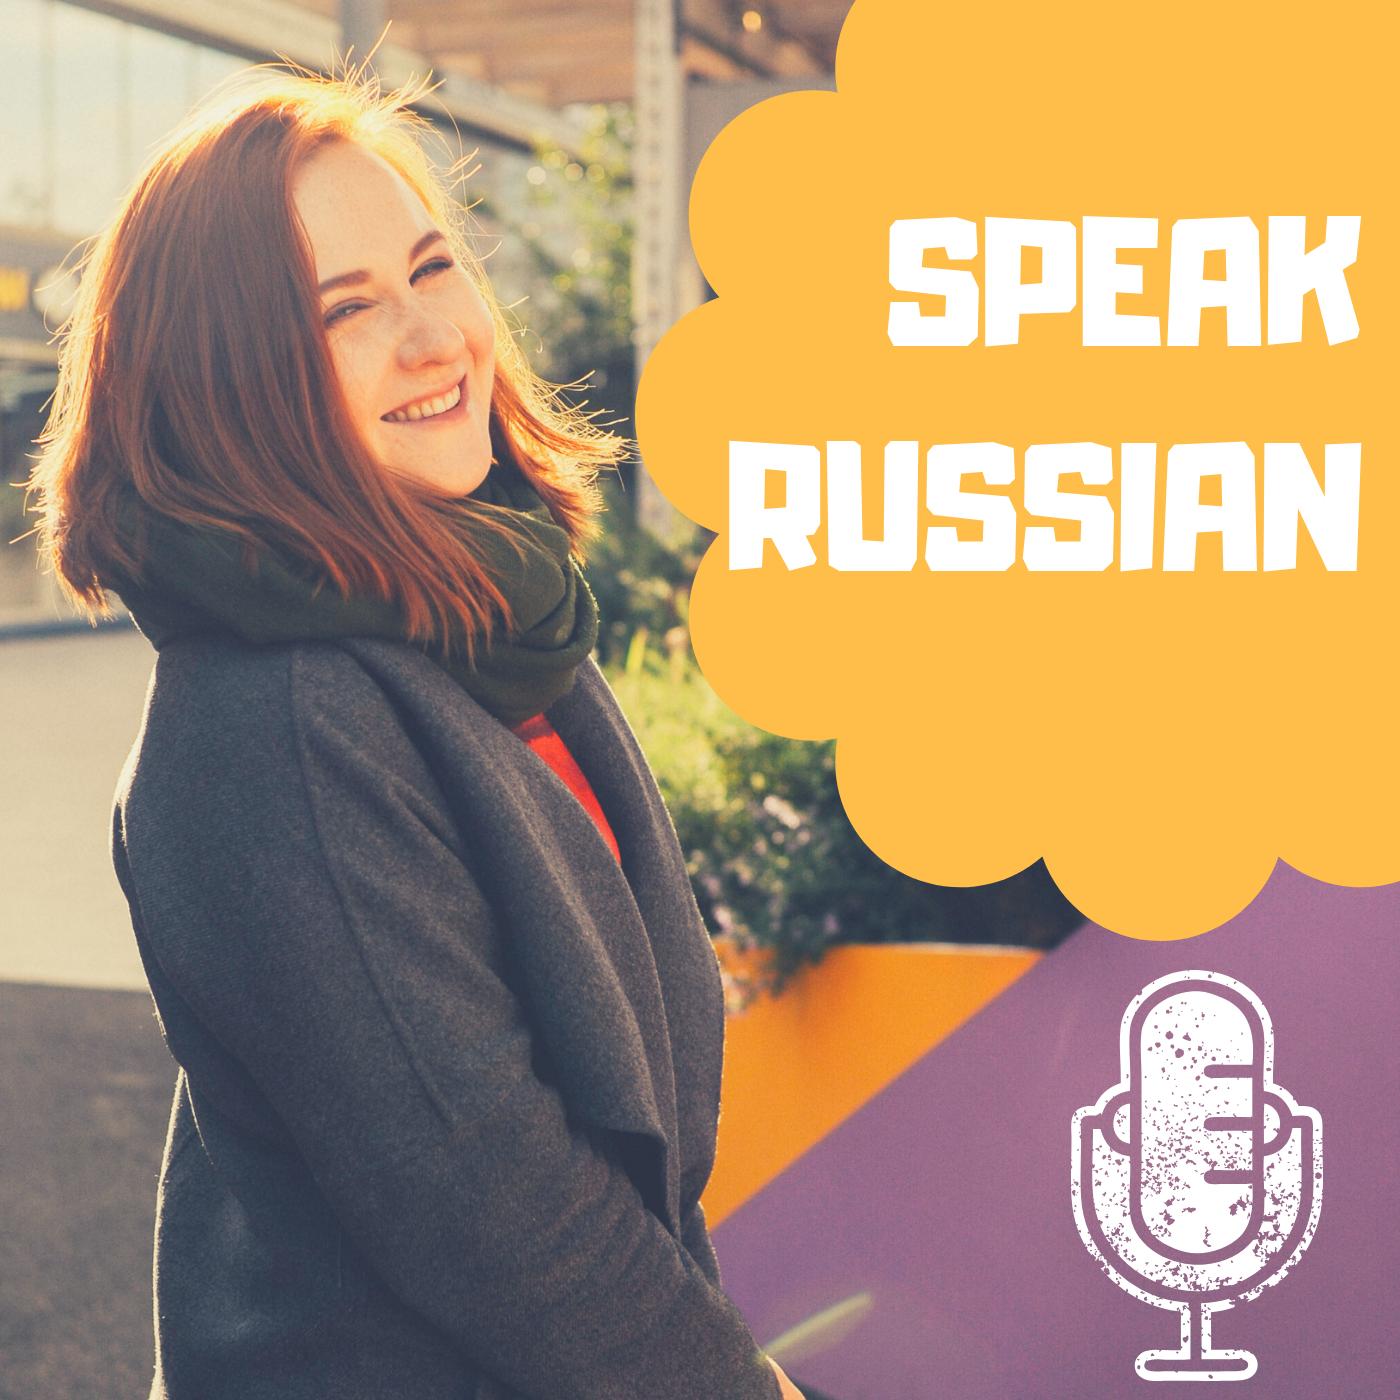 Russian Pronunciation Podcast –Speak Russian show art